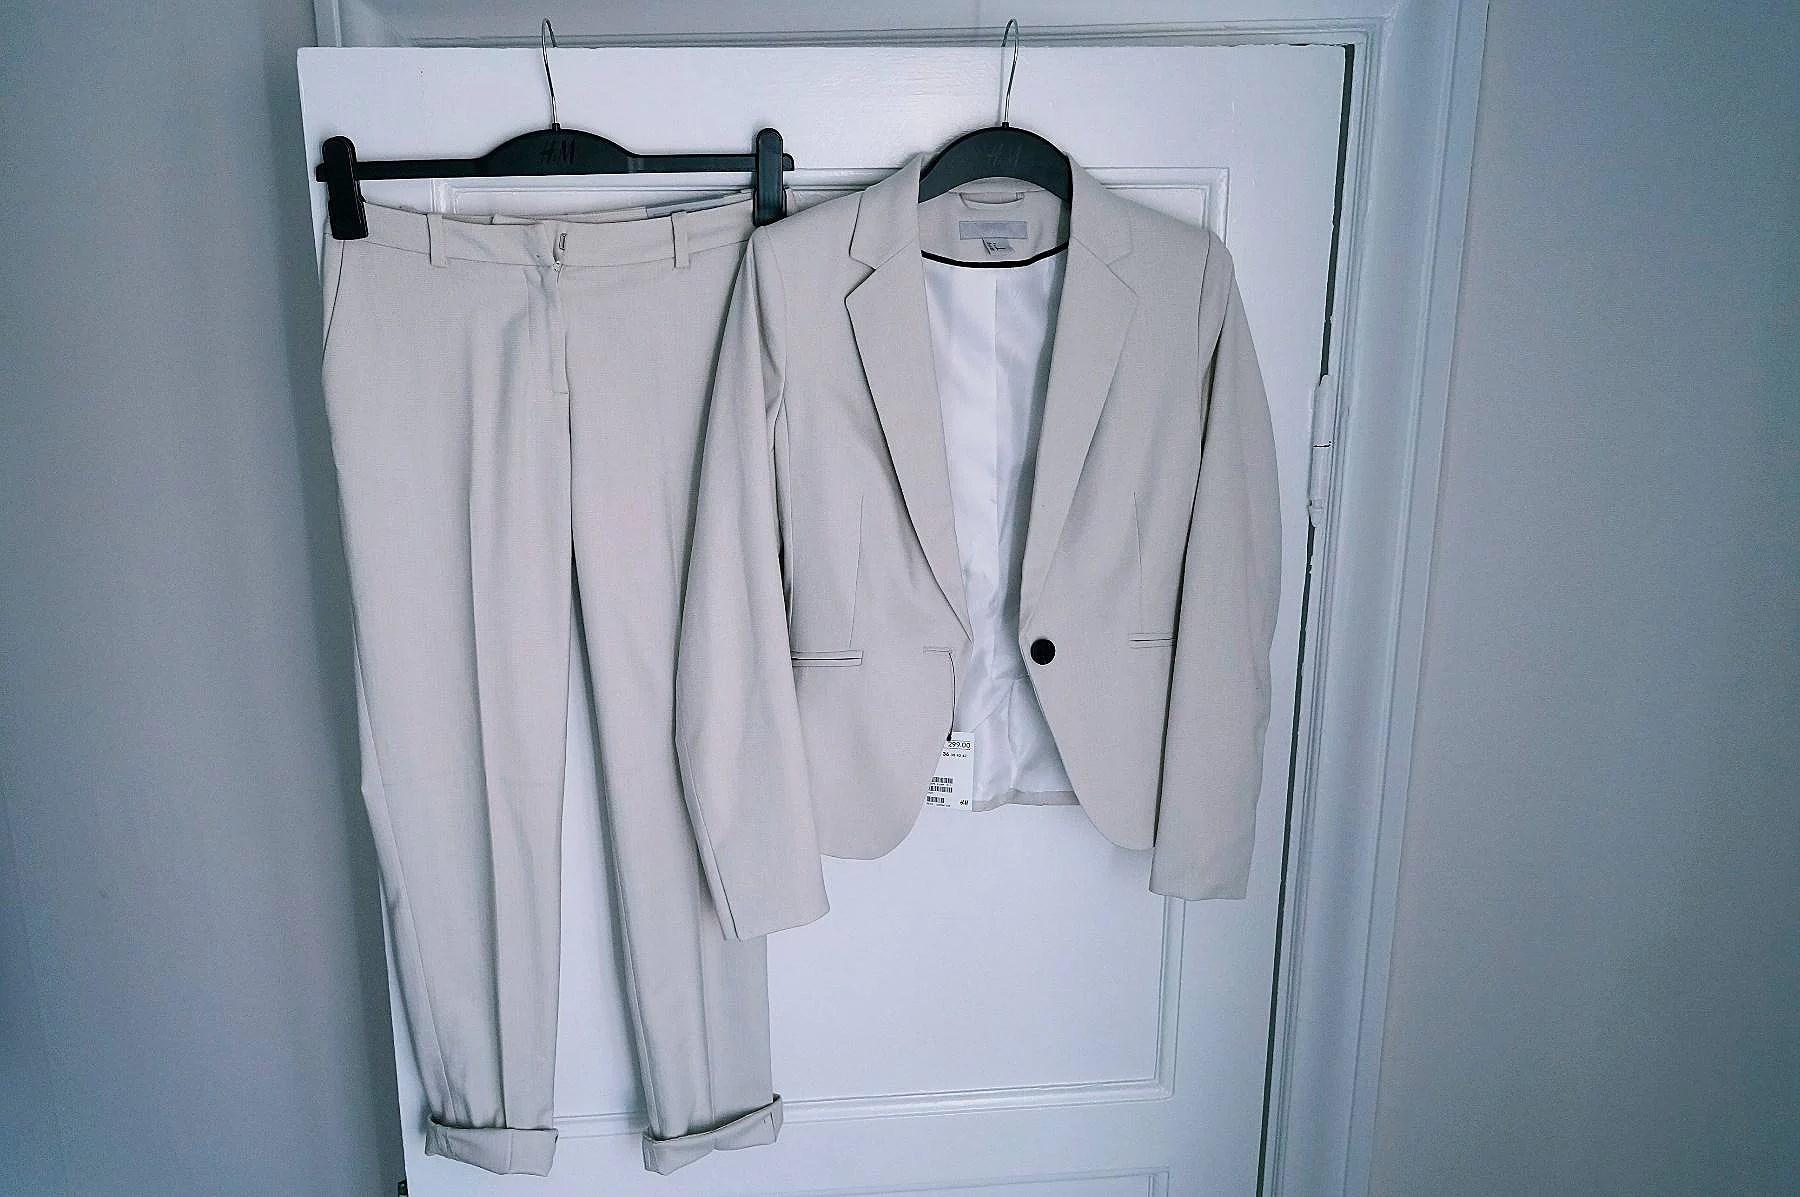 Unnat mig en kostym